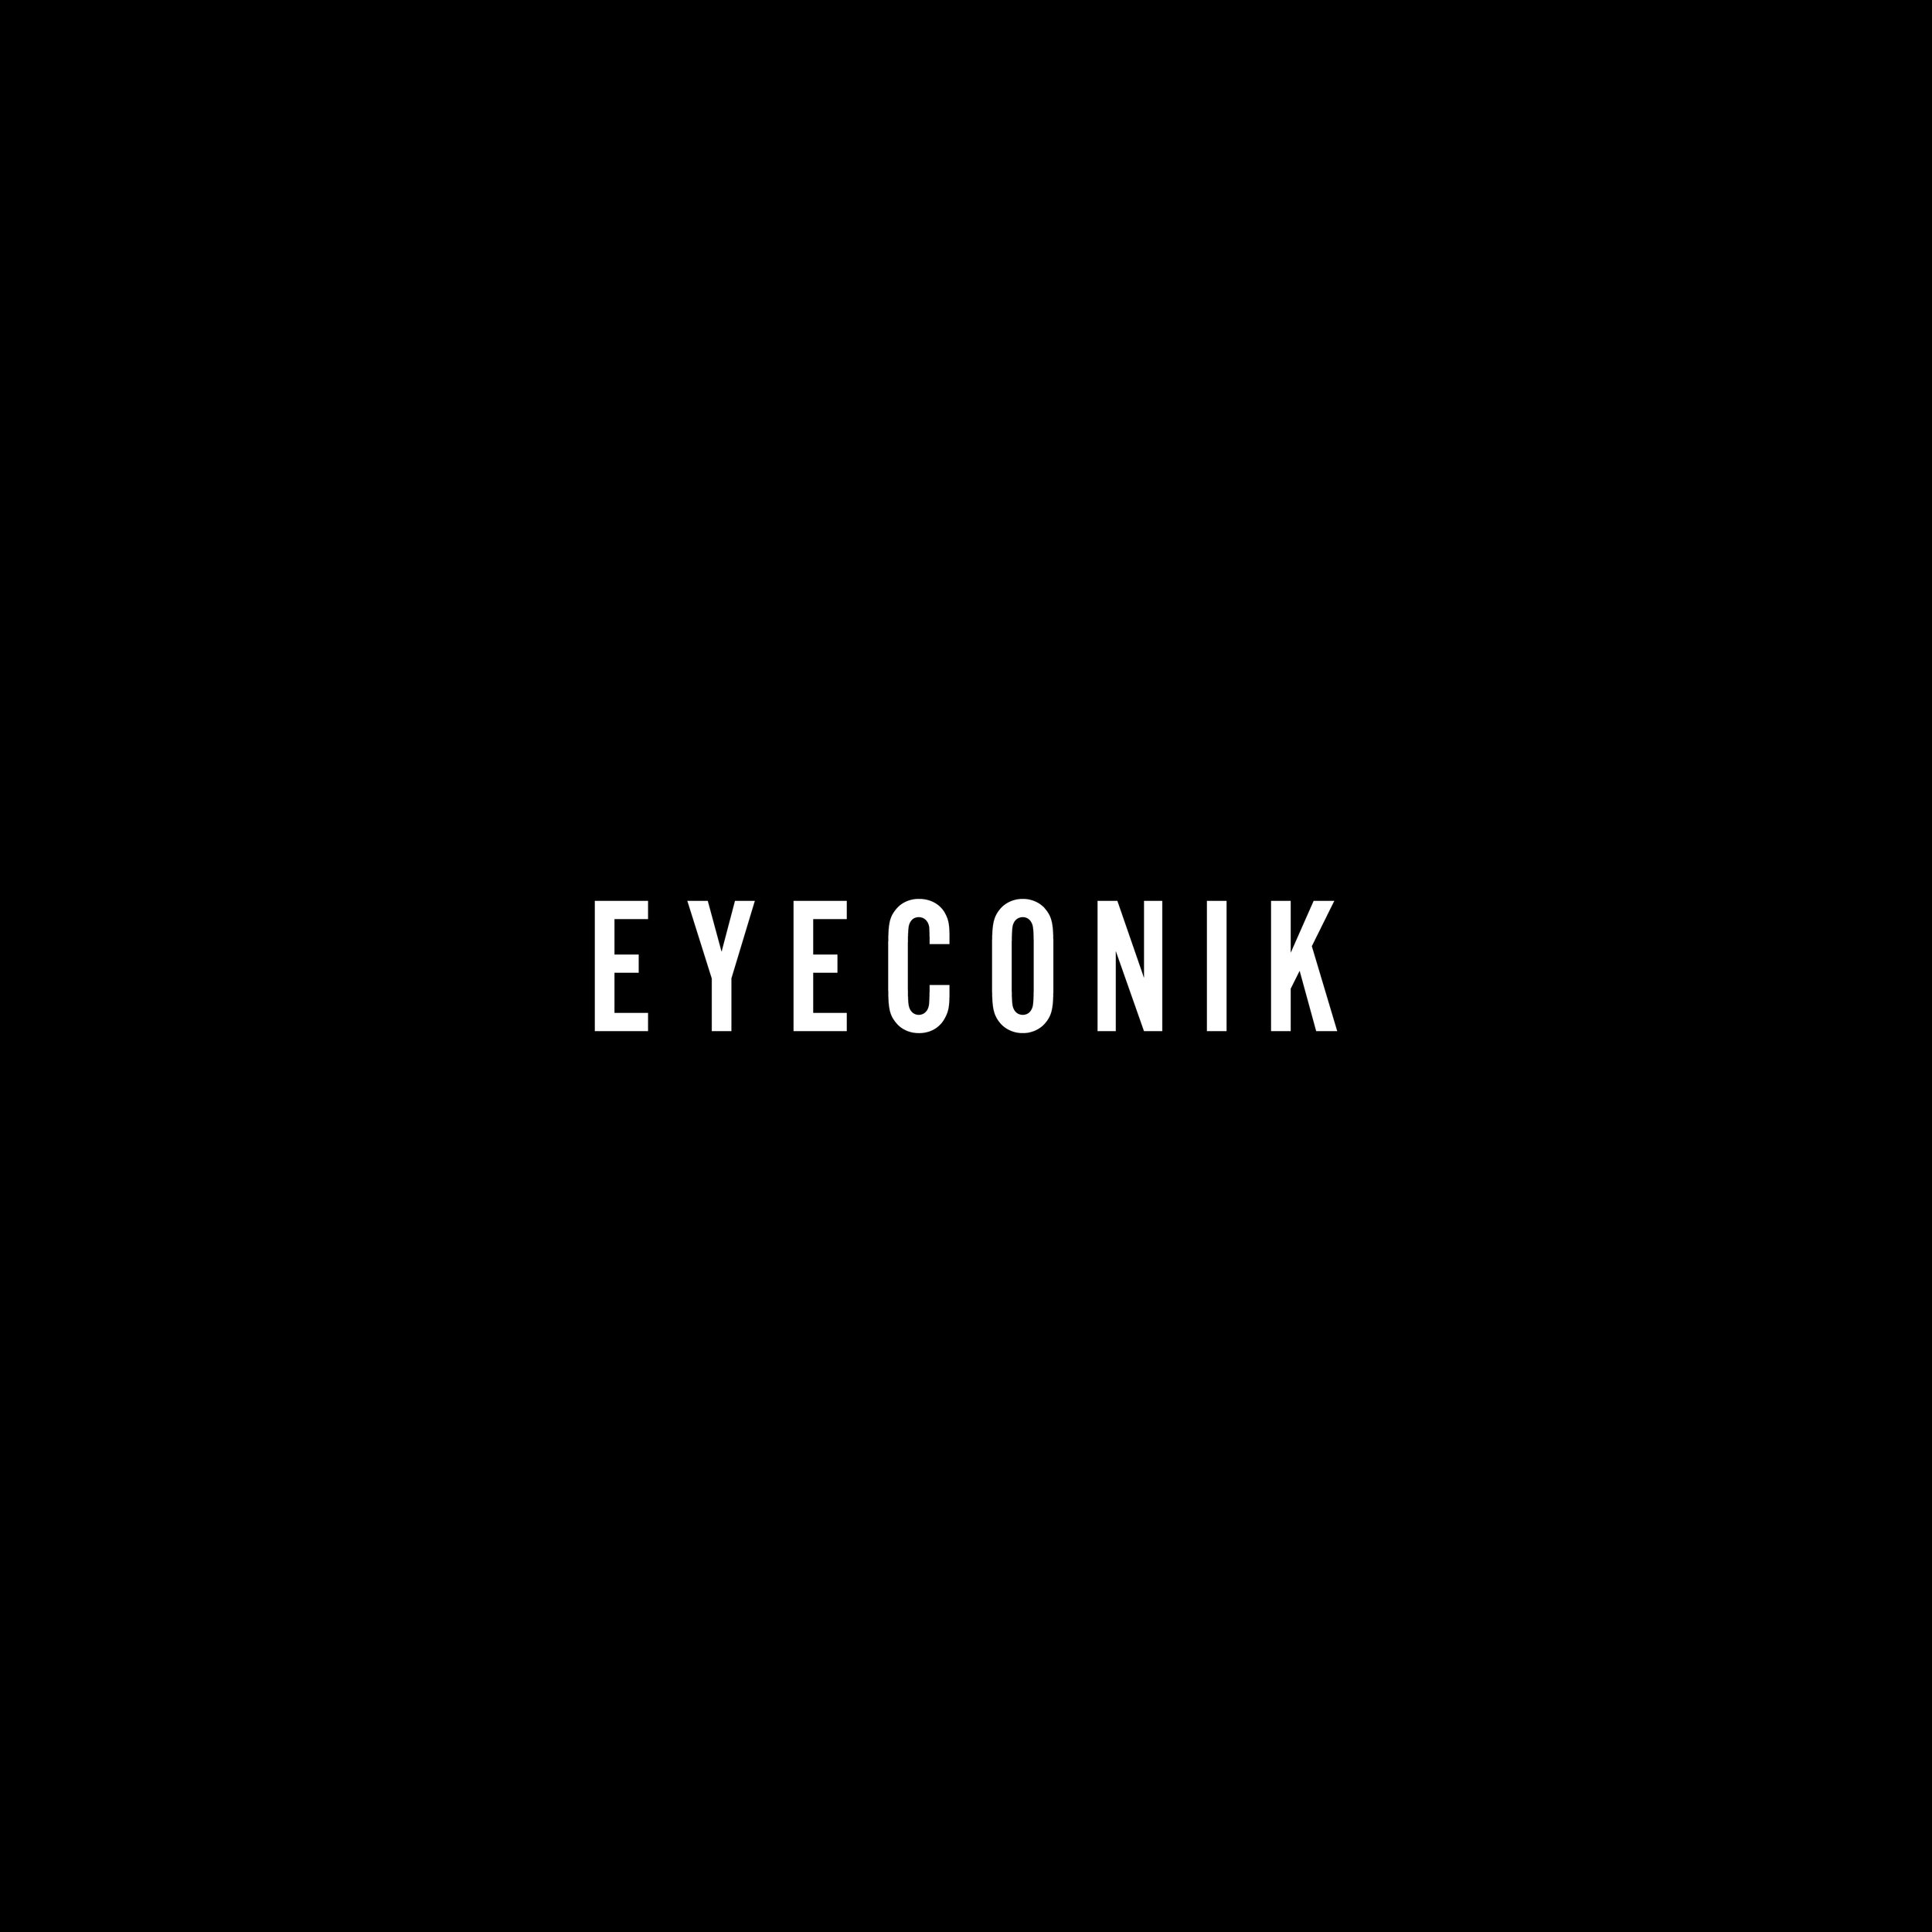 EYEconik-isnta-02.jpg